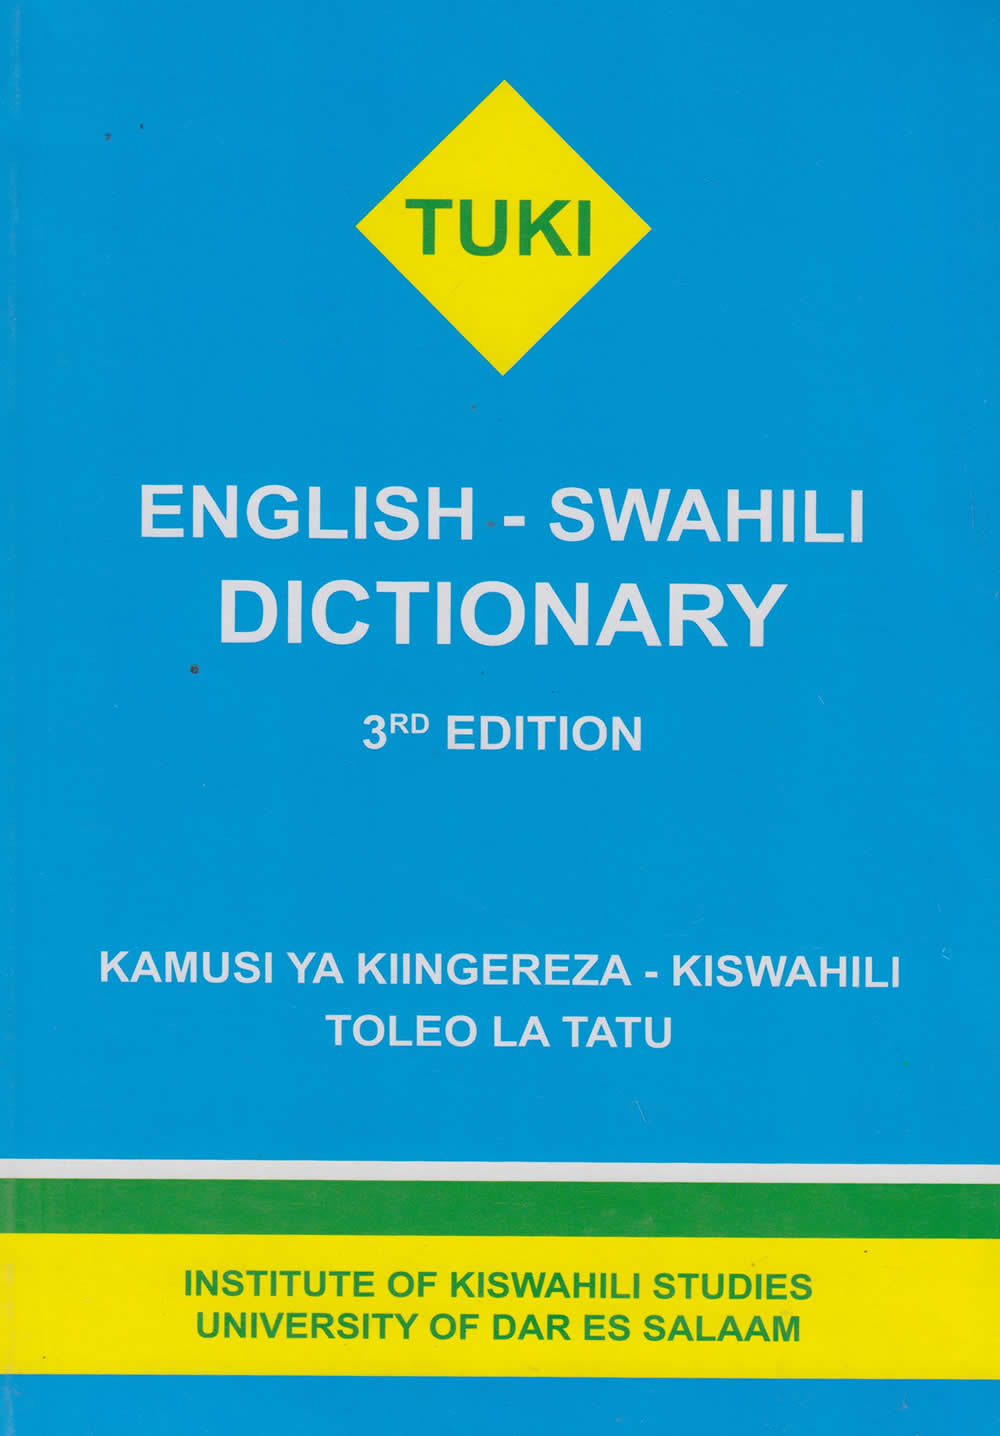 English In Italian: Tuki English-Swahili Dictionary